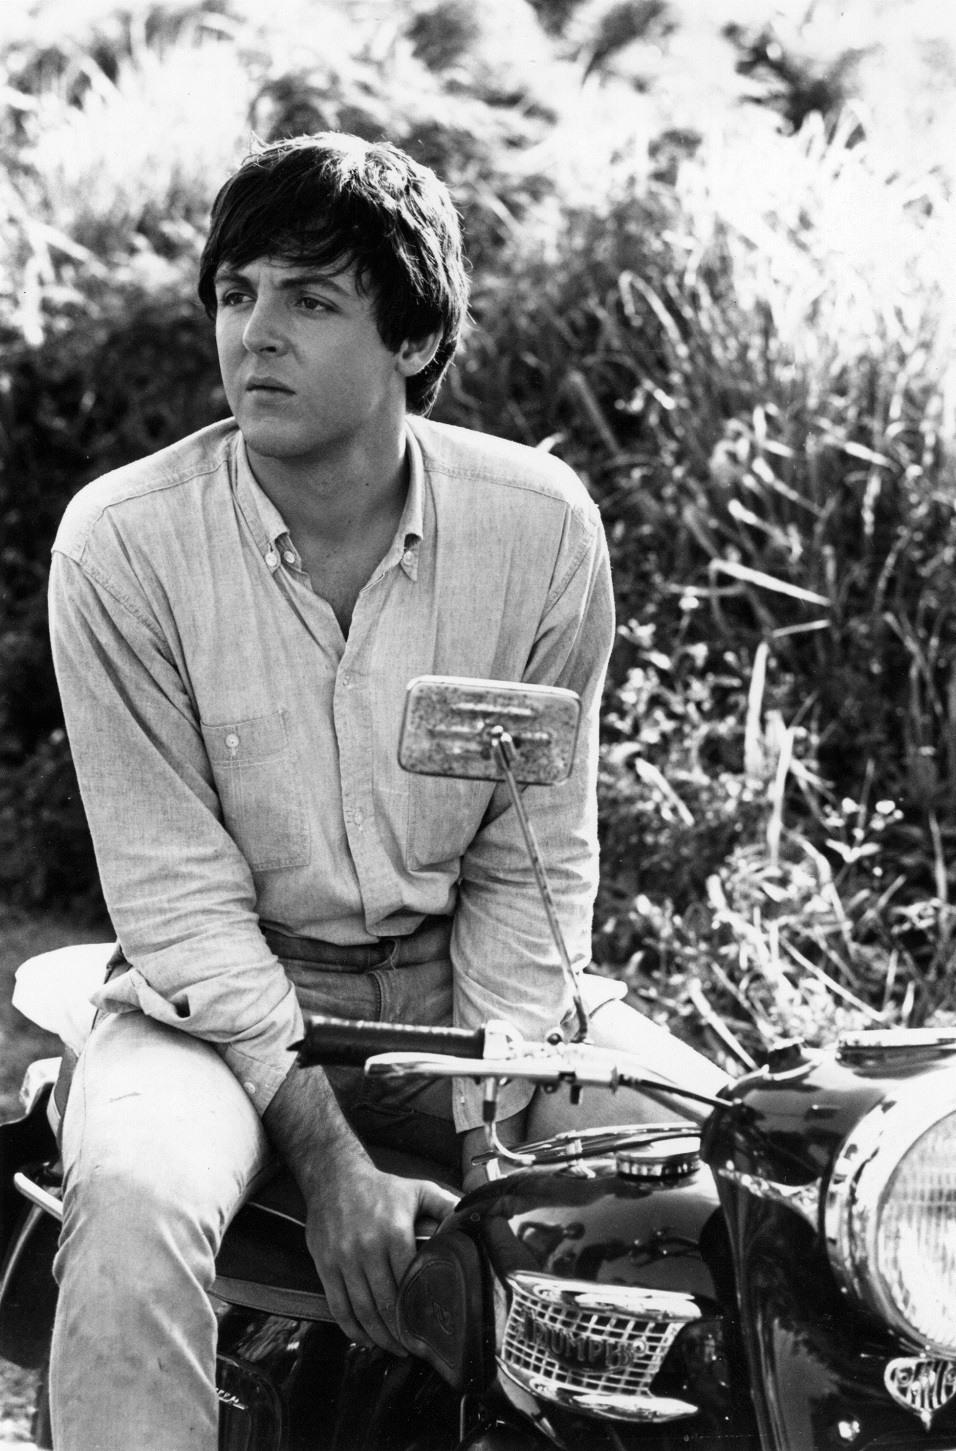 Paul McCartney of The Beatles sitting astride his motor bike, 1965.